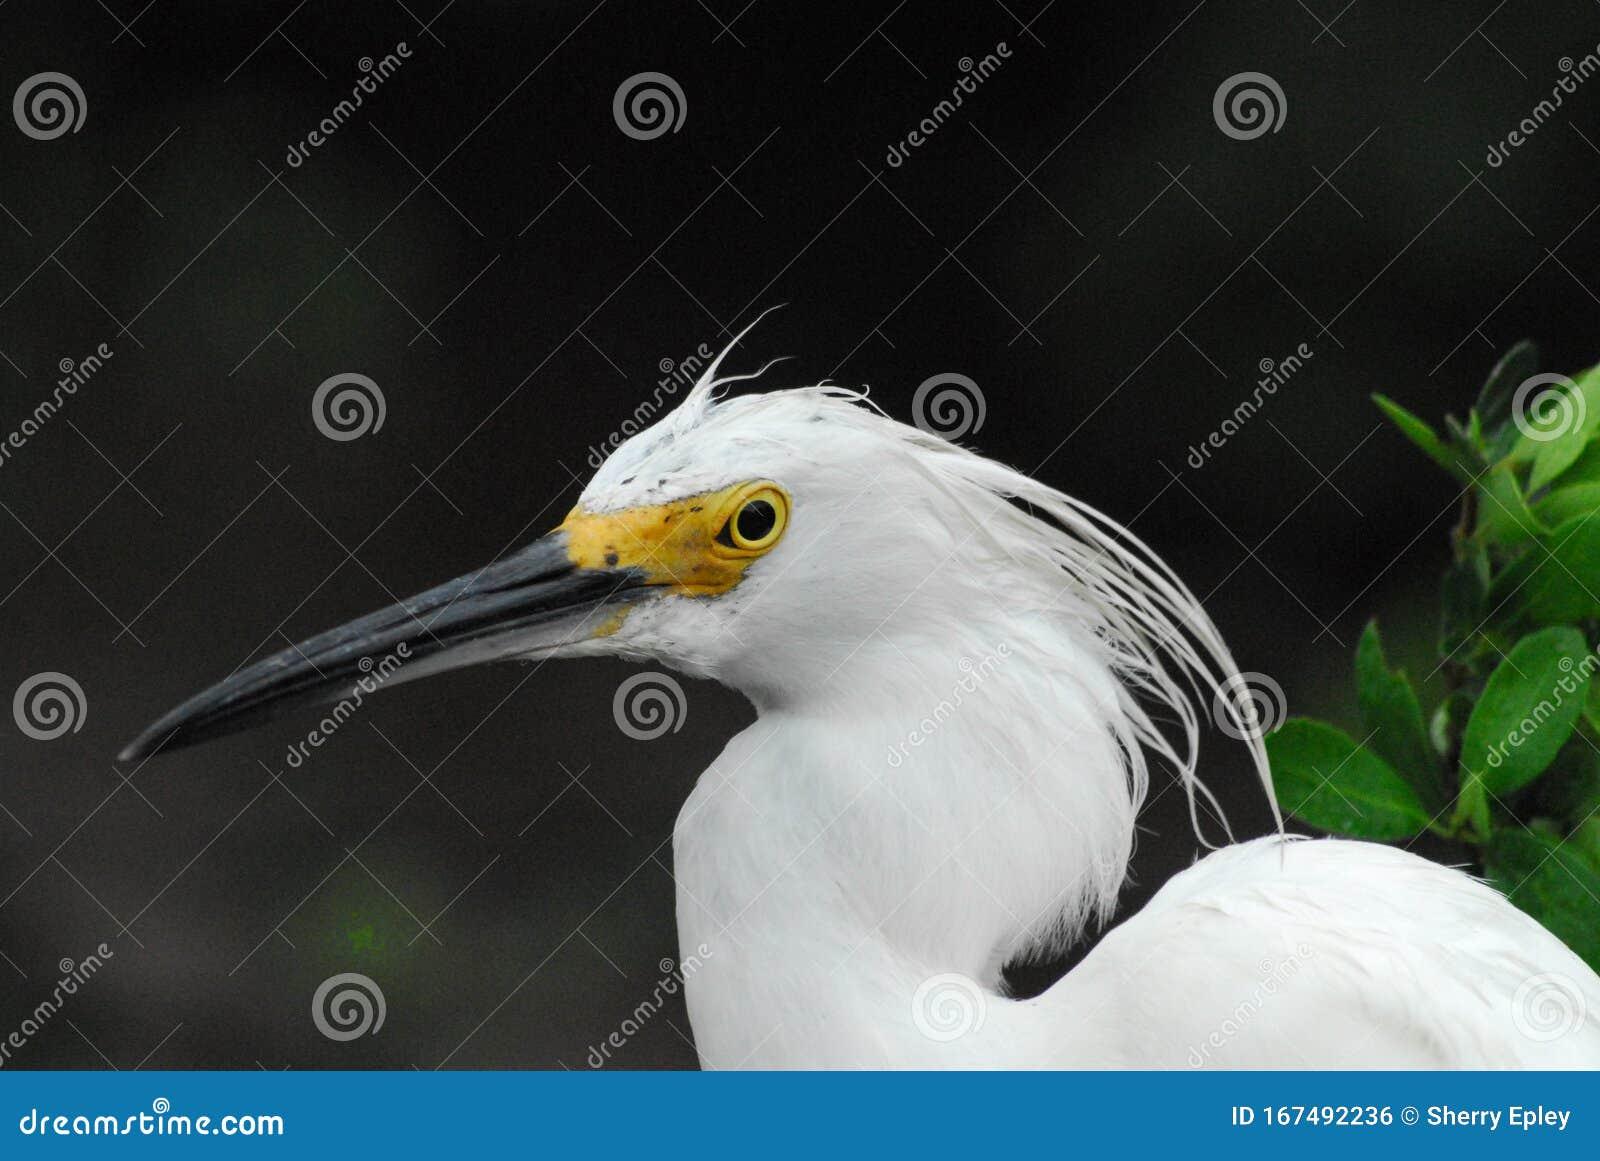 Birds Florida Close Up Portrait Of A Wild Snowy Egret Stock Photo Image Of Dark Close 167492236